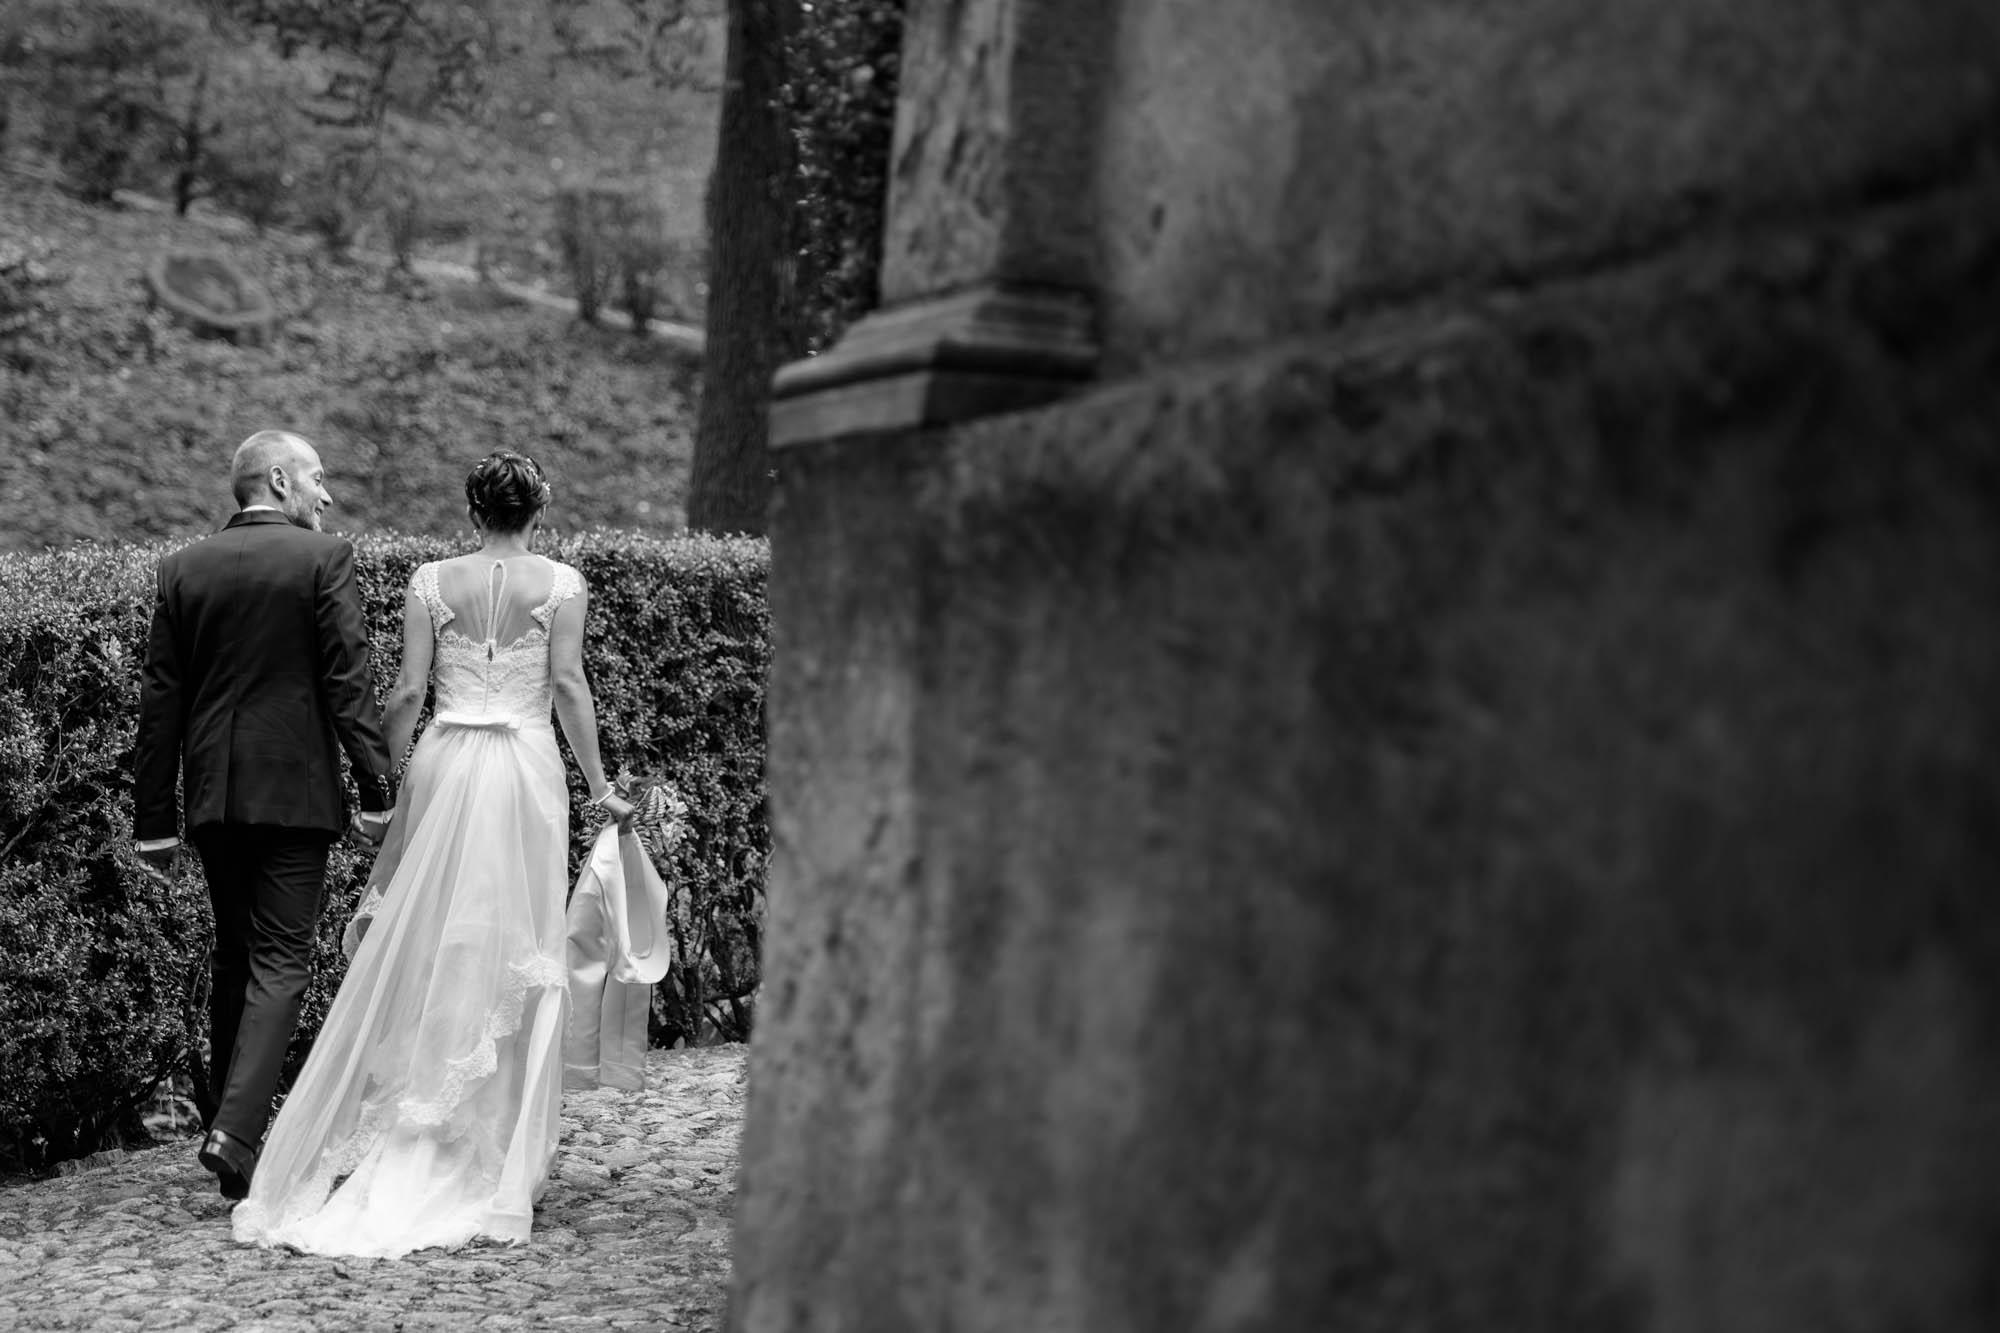 Valsesia Wedding - Servizi fotografici per matrimoni, Borgosesia, Varallo, Valsesia, Piemonte